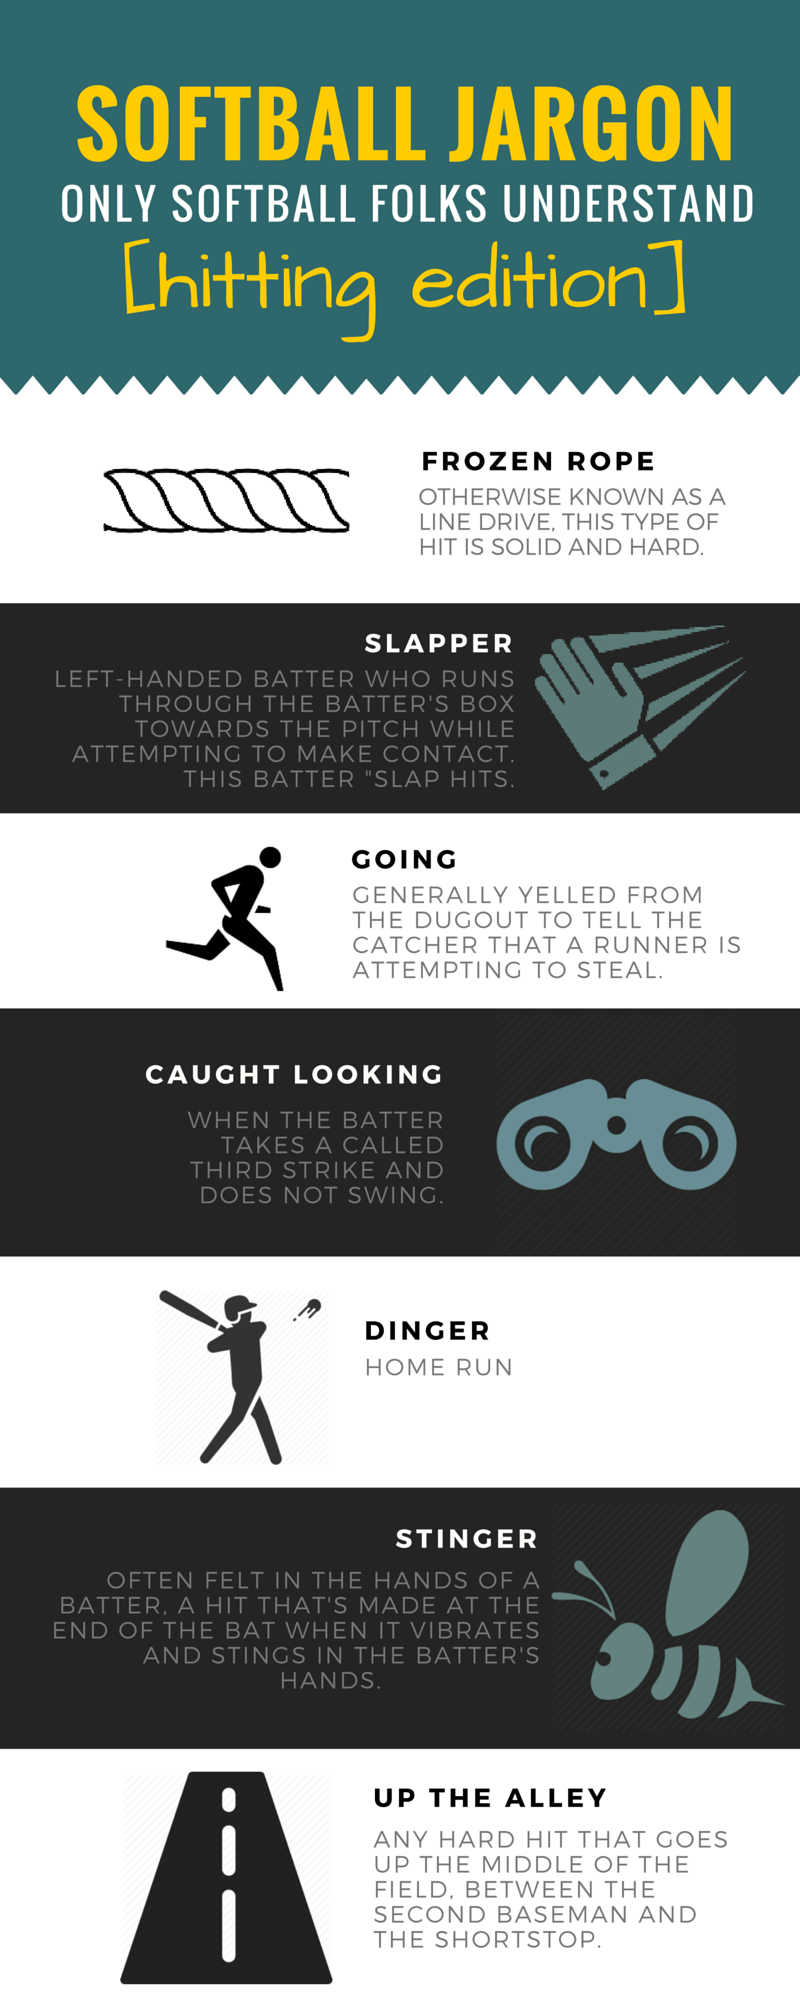 Softball_Jargon_Hitting_Edition.png